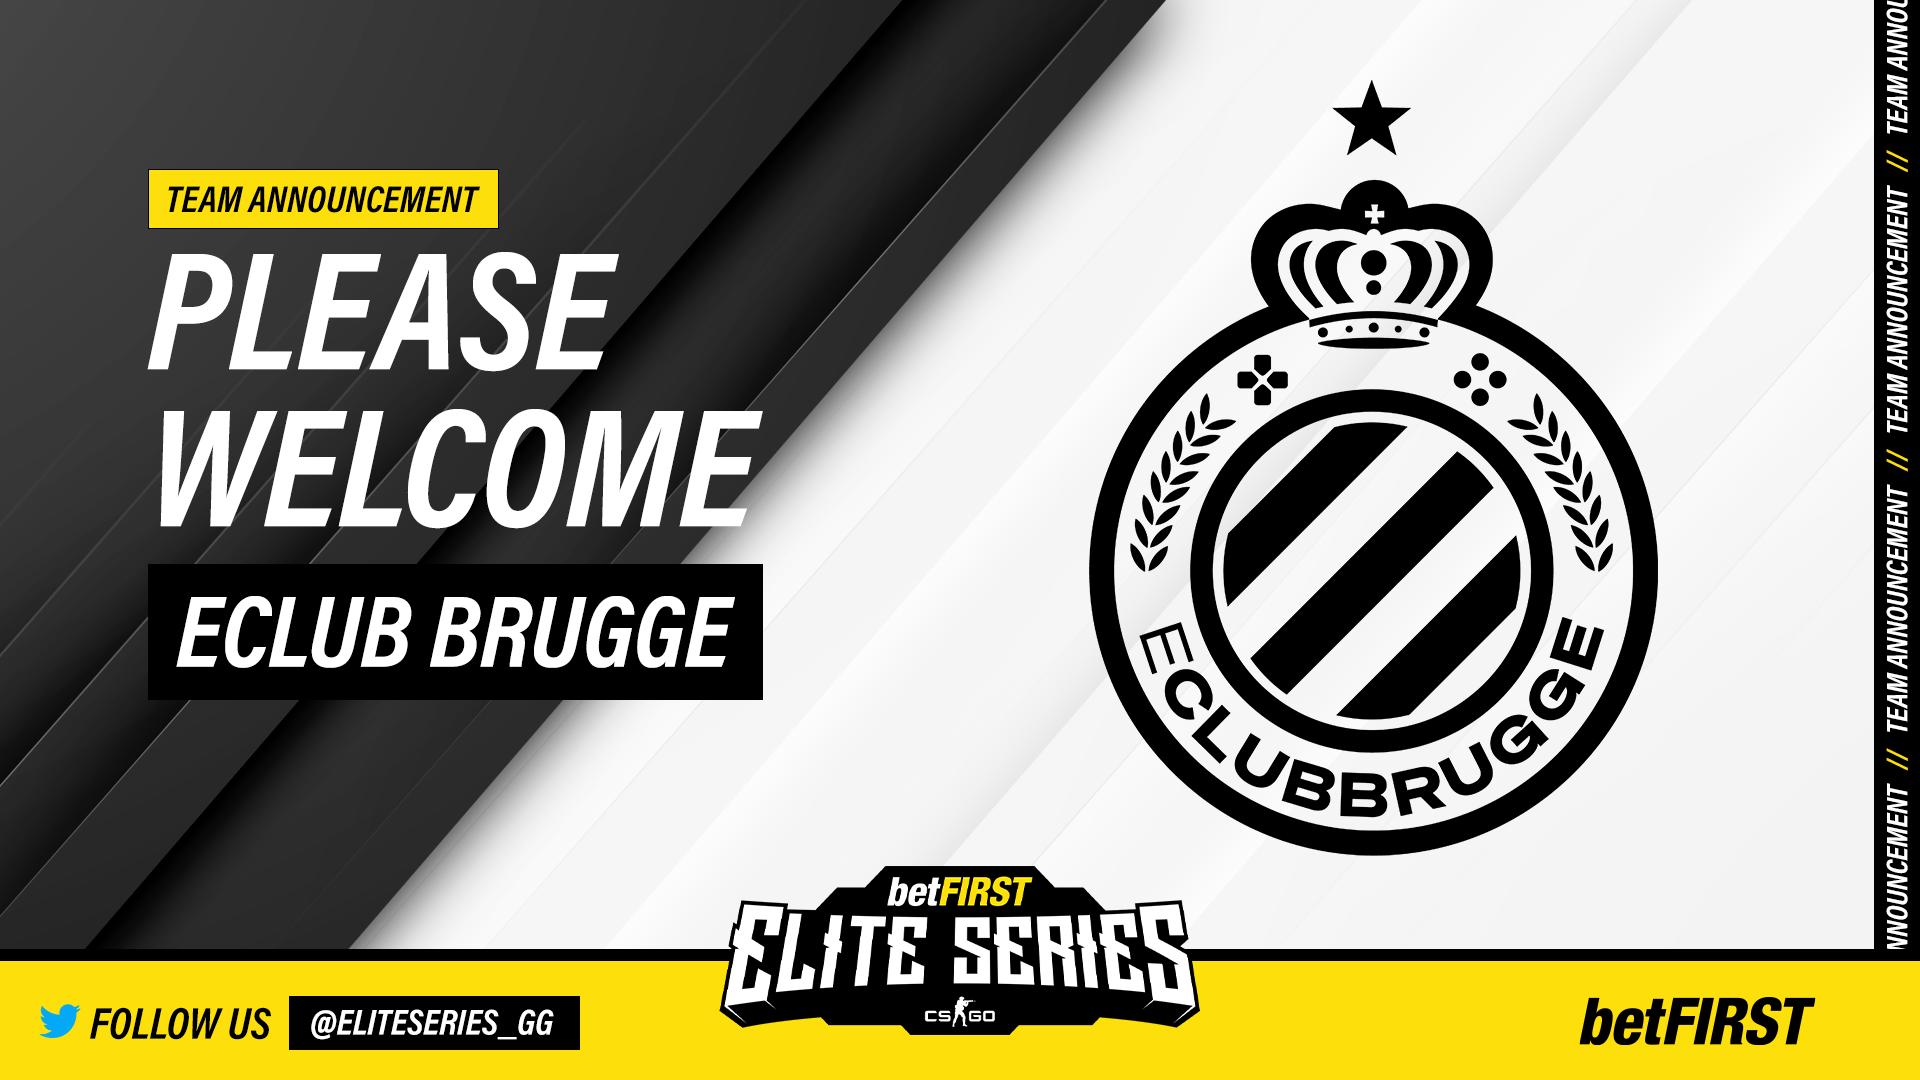 Club Brugge Elite Series League CS:GO Announcement